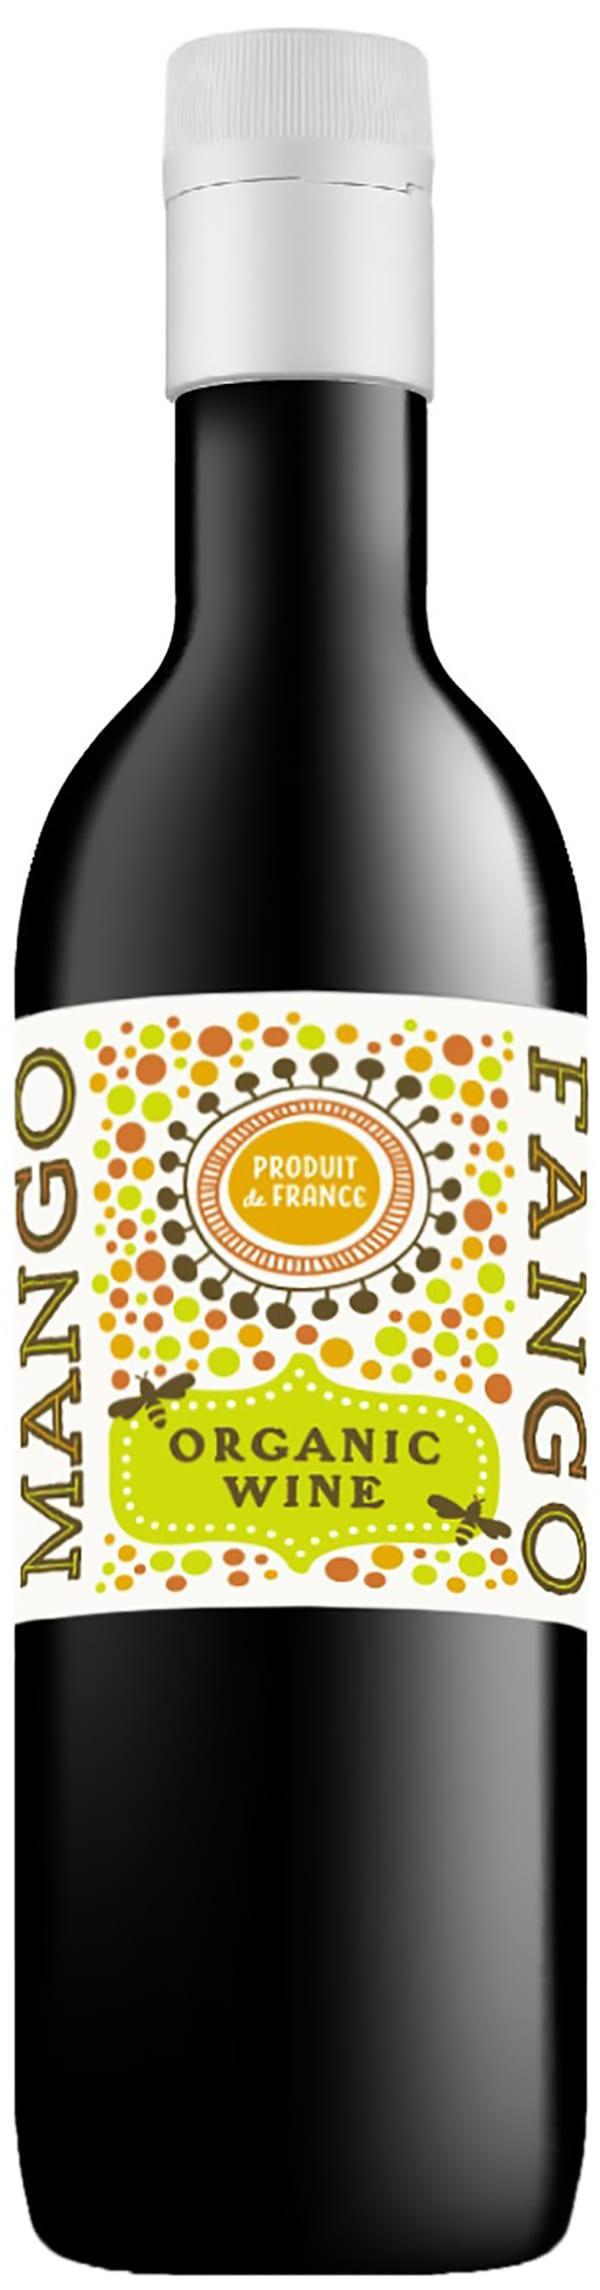 Mango Fango Grenache Syrah Organic 2015 muovipullo